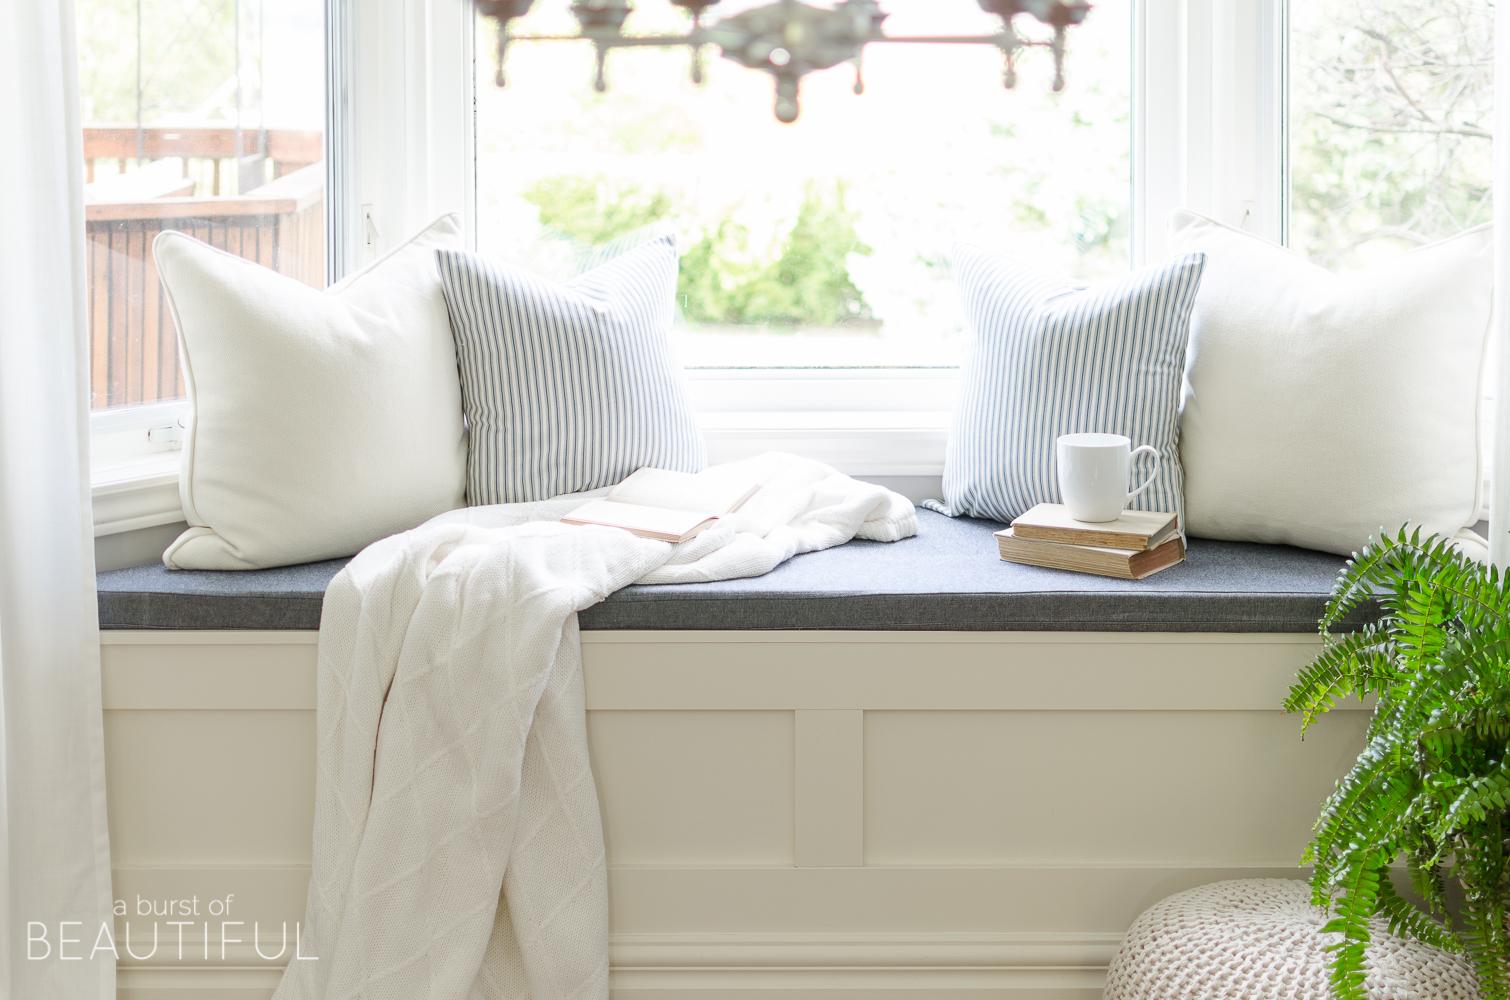 Bedroom Window Bench diy window bench with storage - a burst of beautiful